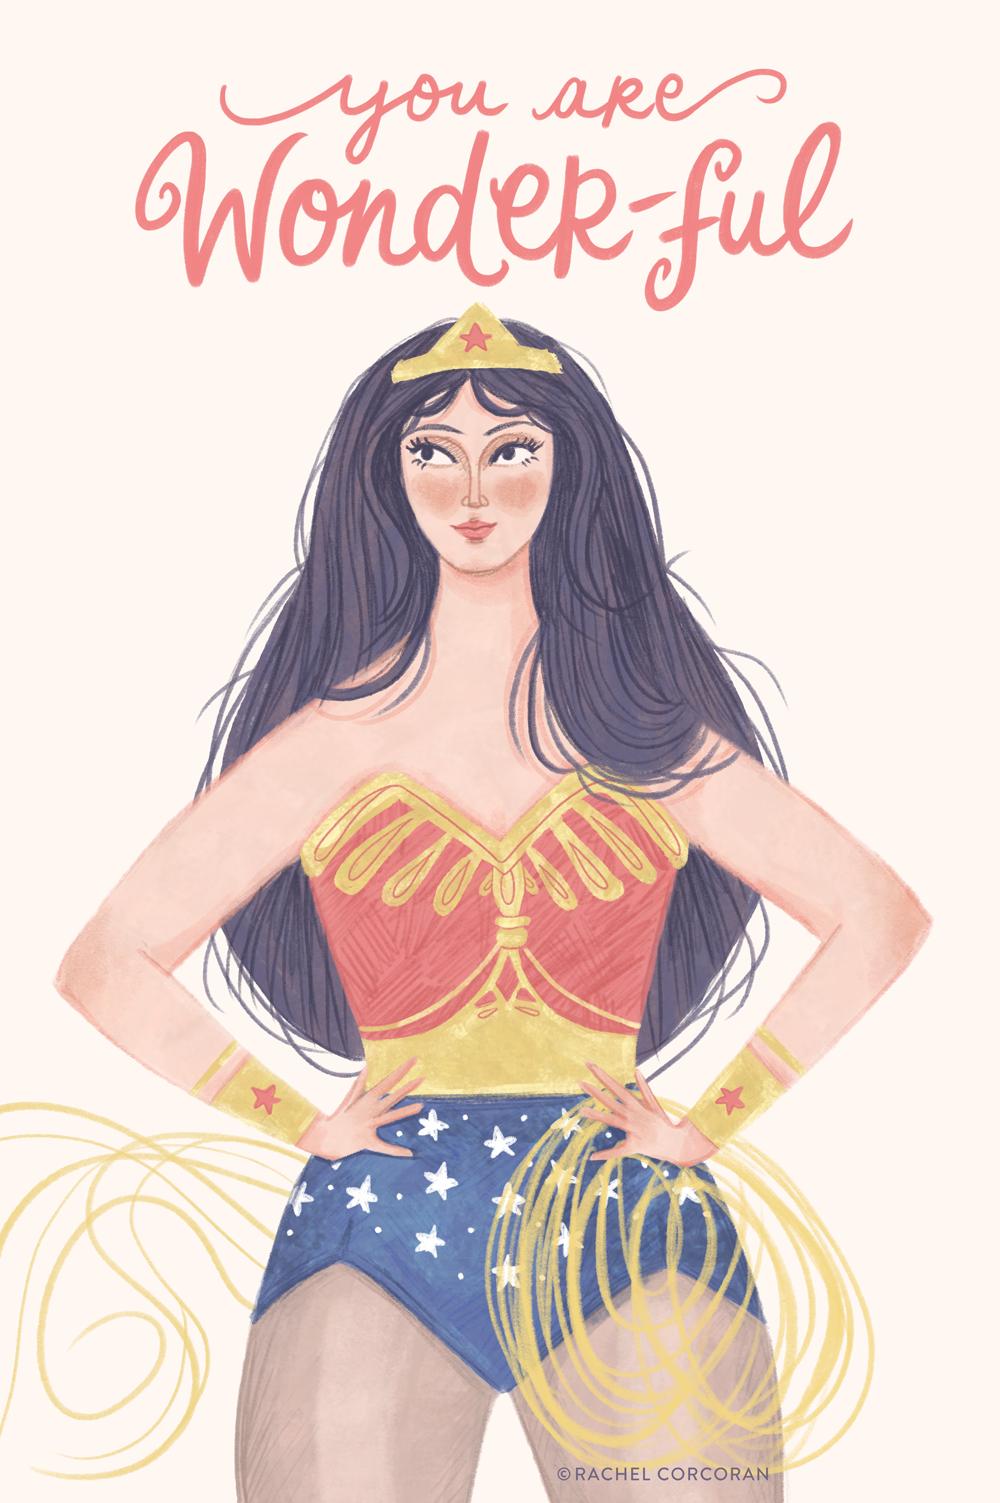 Wonder Woman illustration by Rachel Corcoran